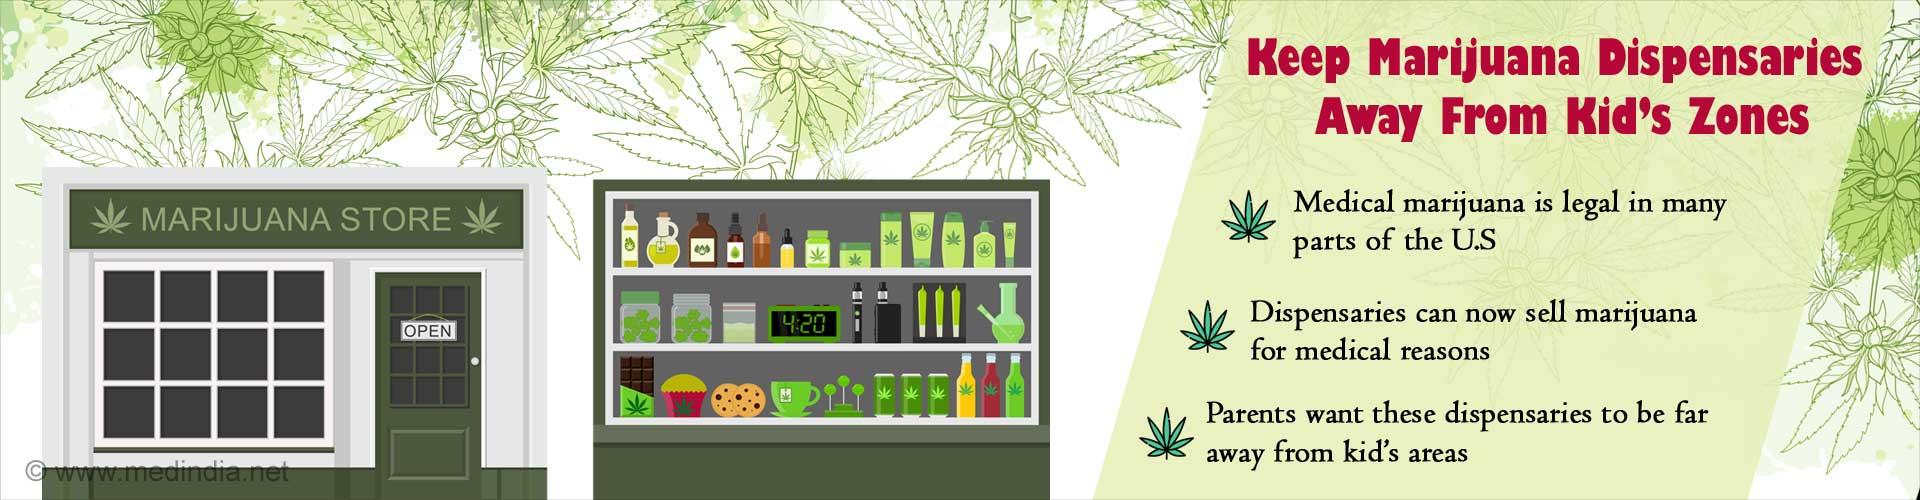 Medical Marijuana Dispensaries Should Be Far Away From Kid's Areas